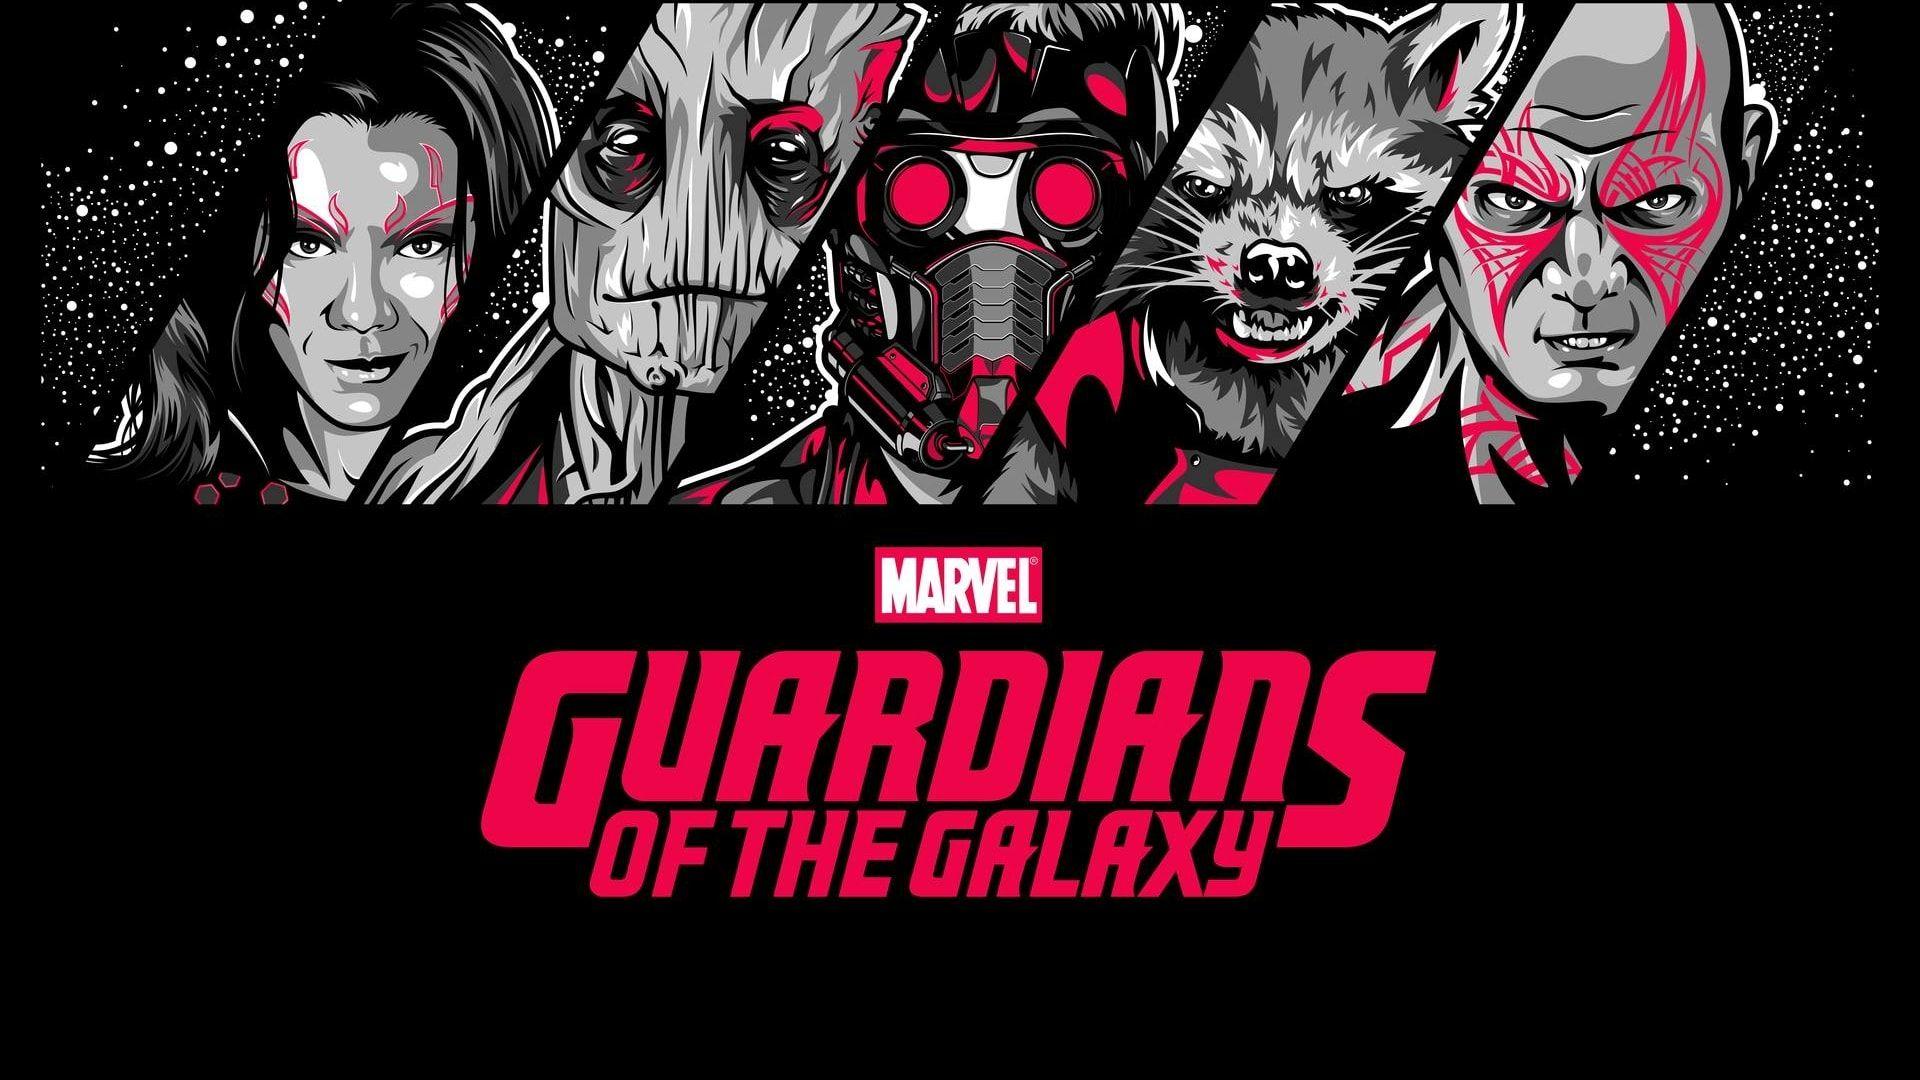 Popular Wallpaper Marvel Guardians The Galaxy - ac8399b92ccda4a5eccea67098f46dd2  Picture_4857.jpg